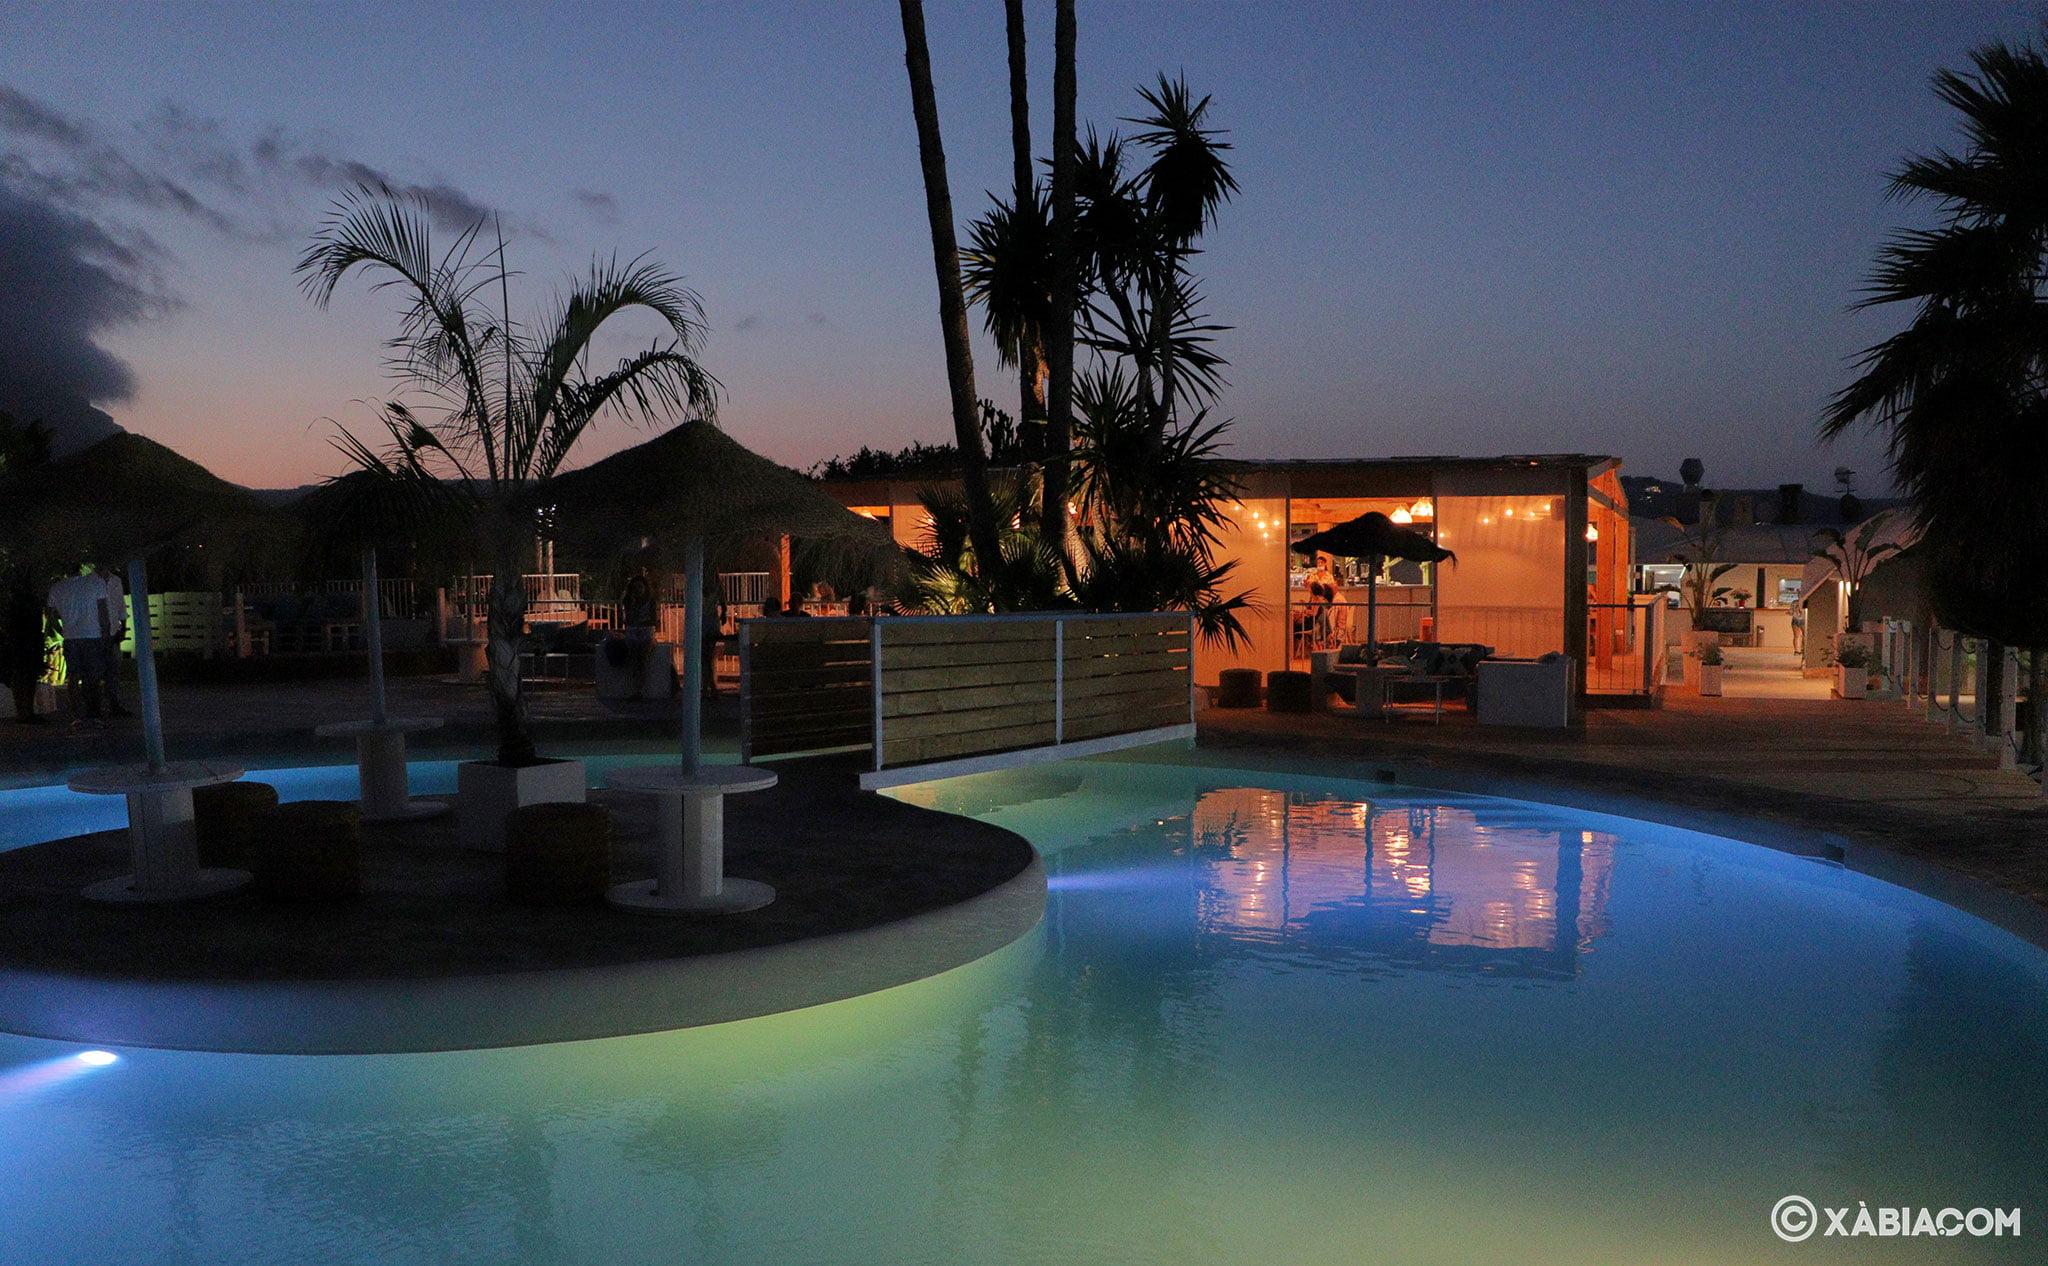 Vista nocturna de Isla Bonita